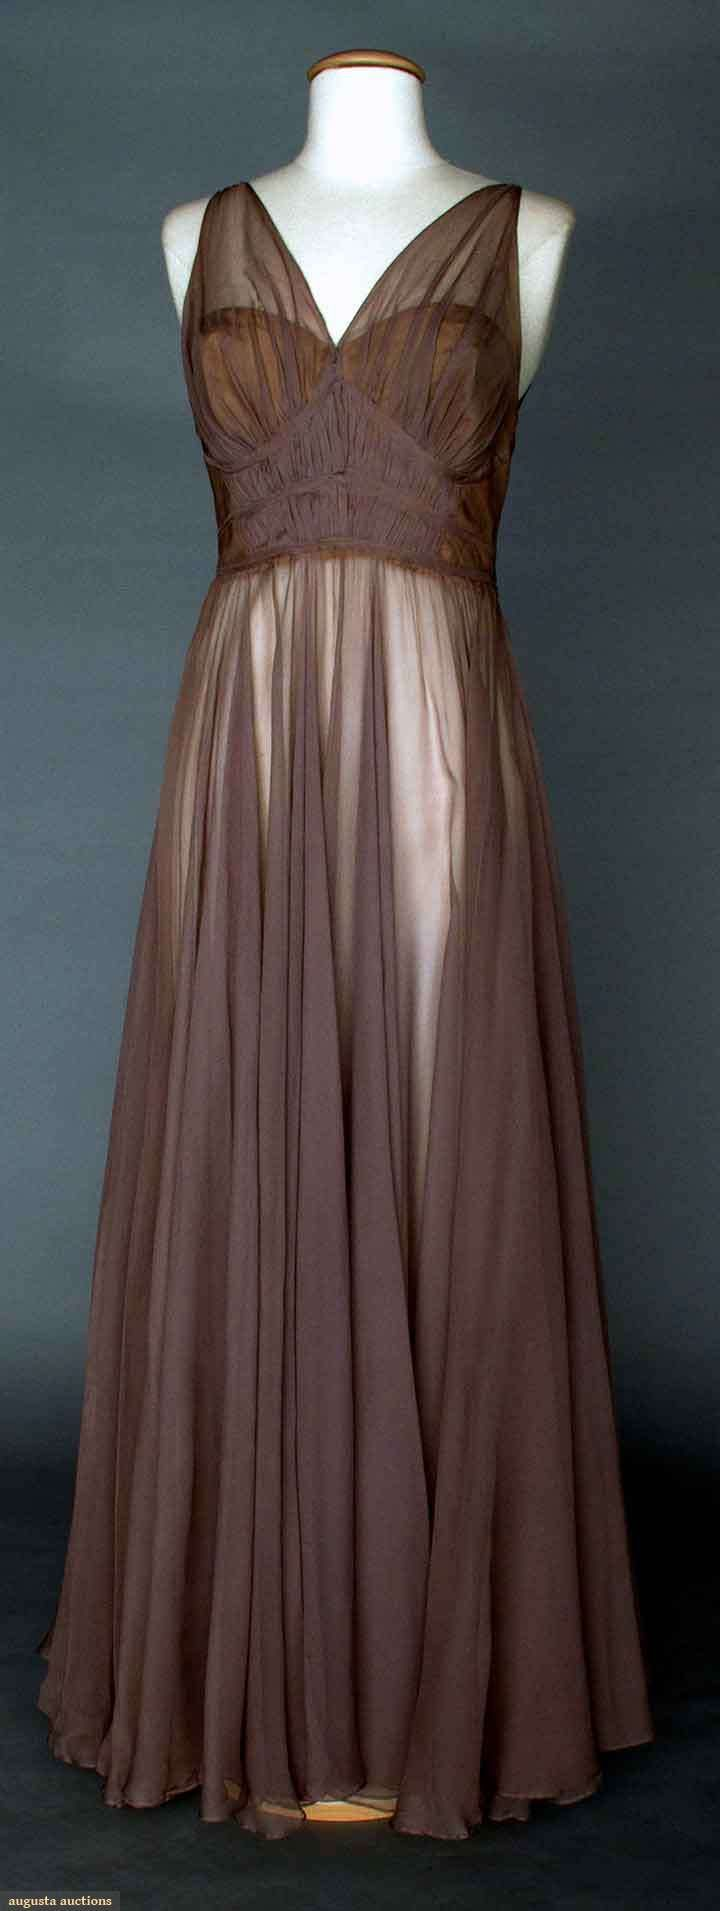 Valentina Mauve Evening Gown, 1930s